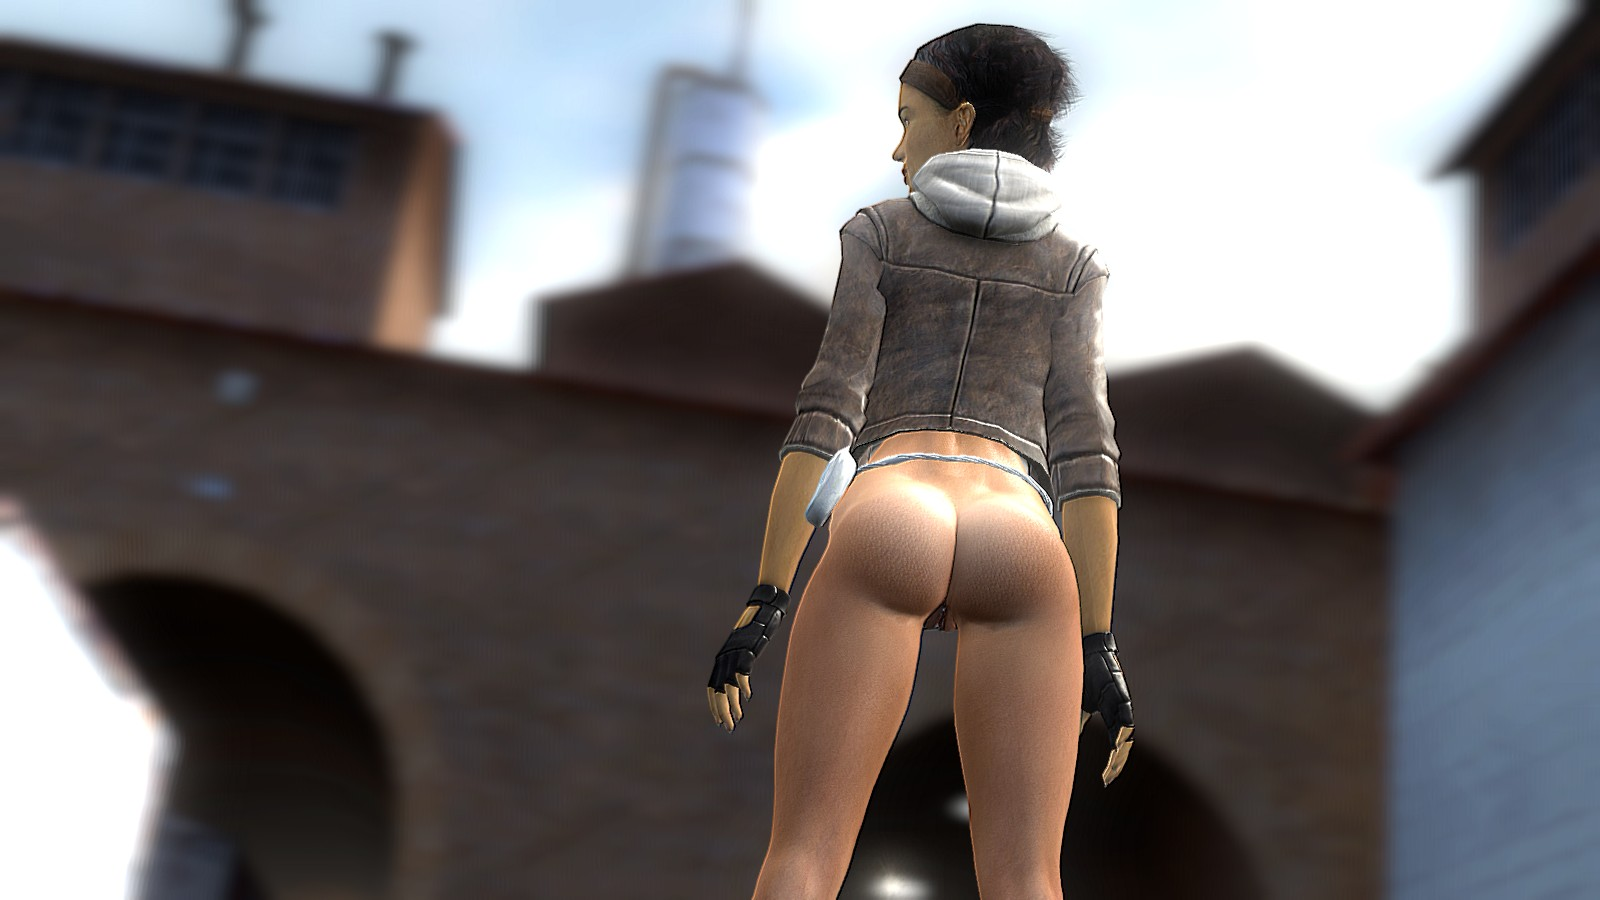 Half-life 2 erotic hentia photo